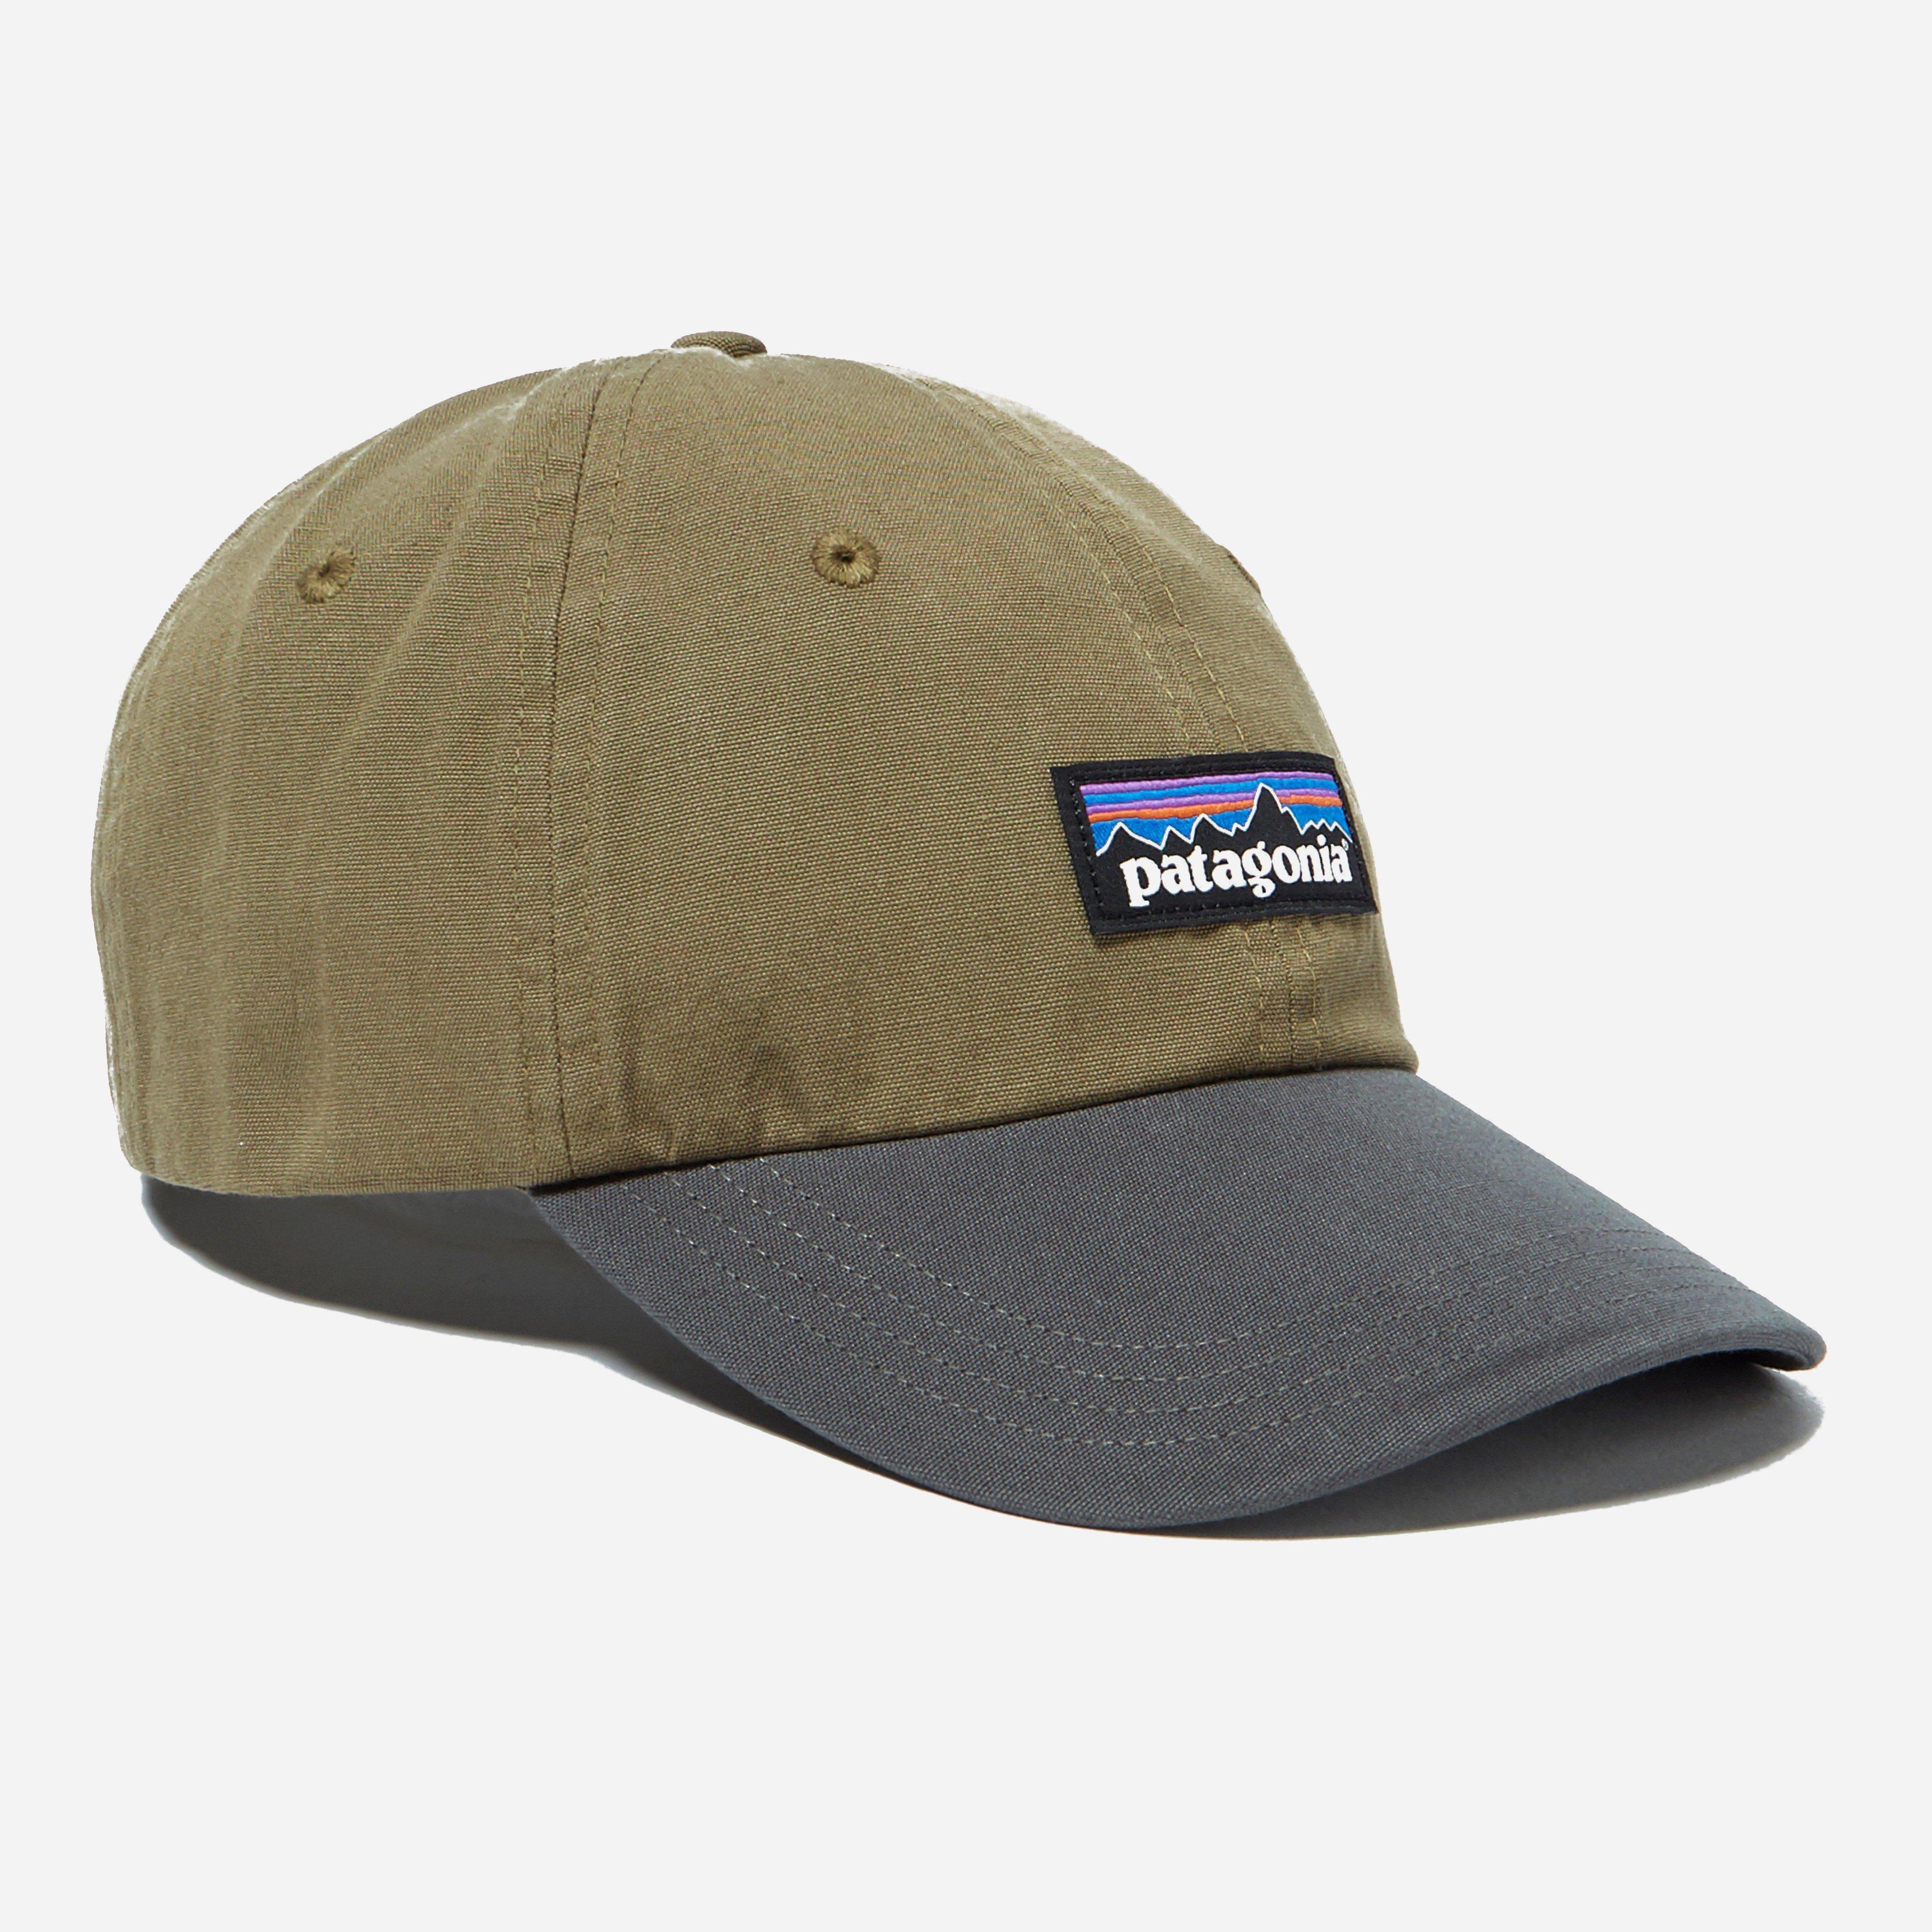 fcecb855cfc Patagonia P6 Label Trad Cap in Green for Men - Lyst